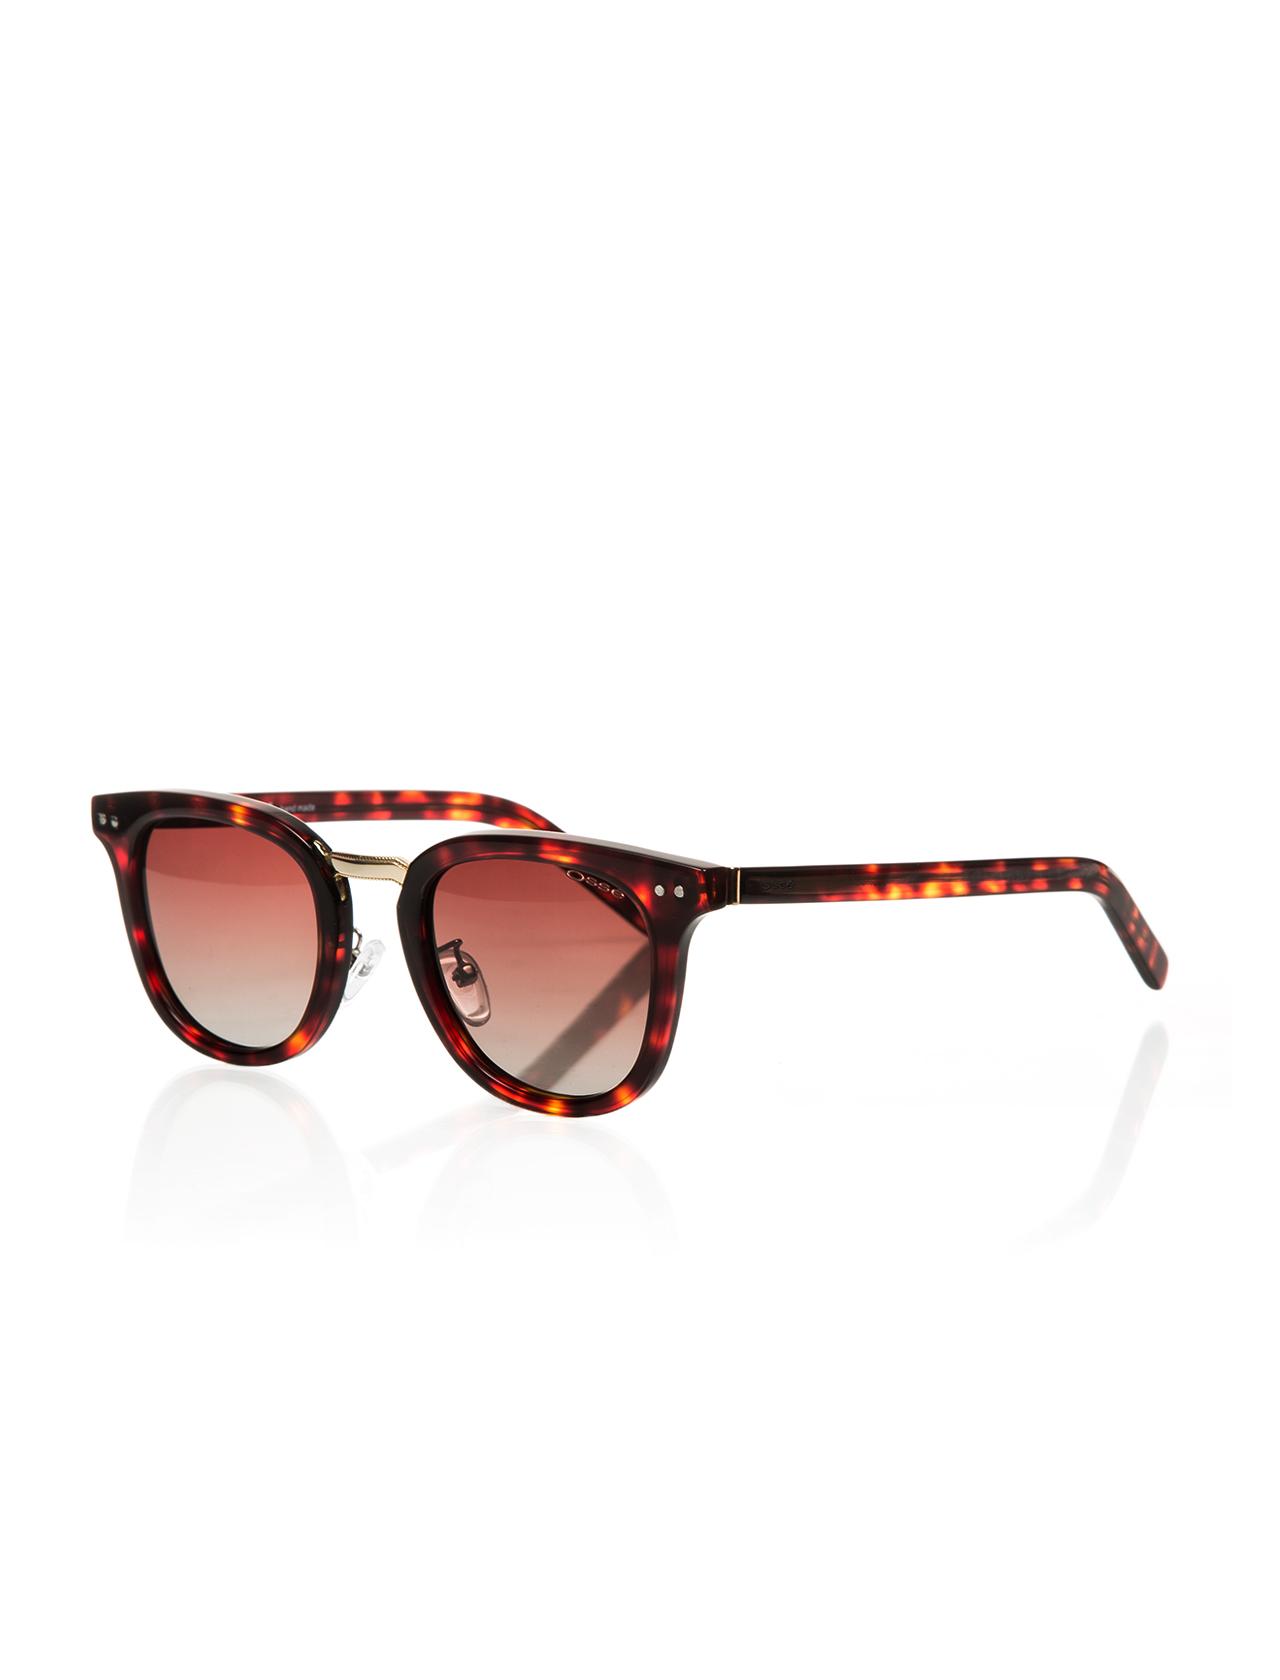 Unisex Patterned Frame Sunglasses